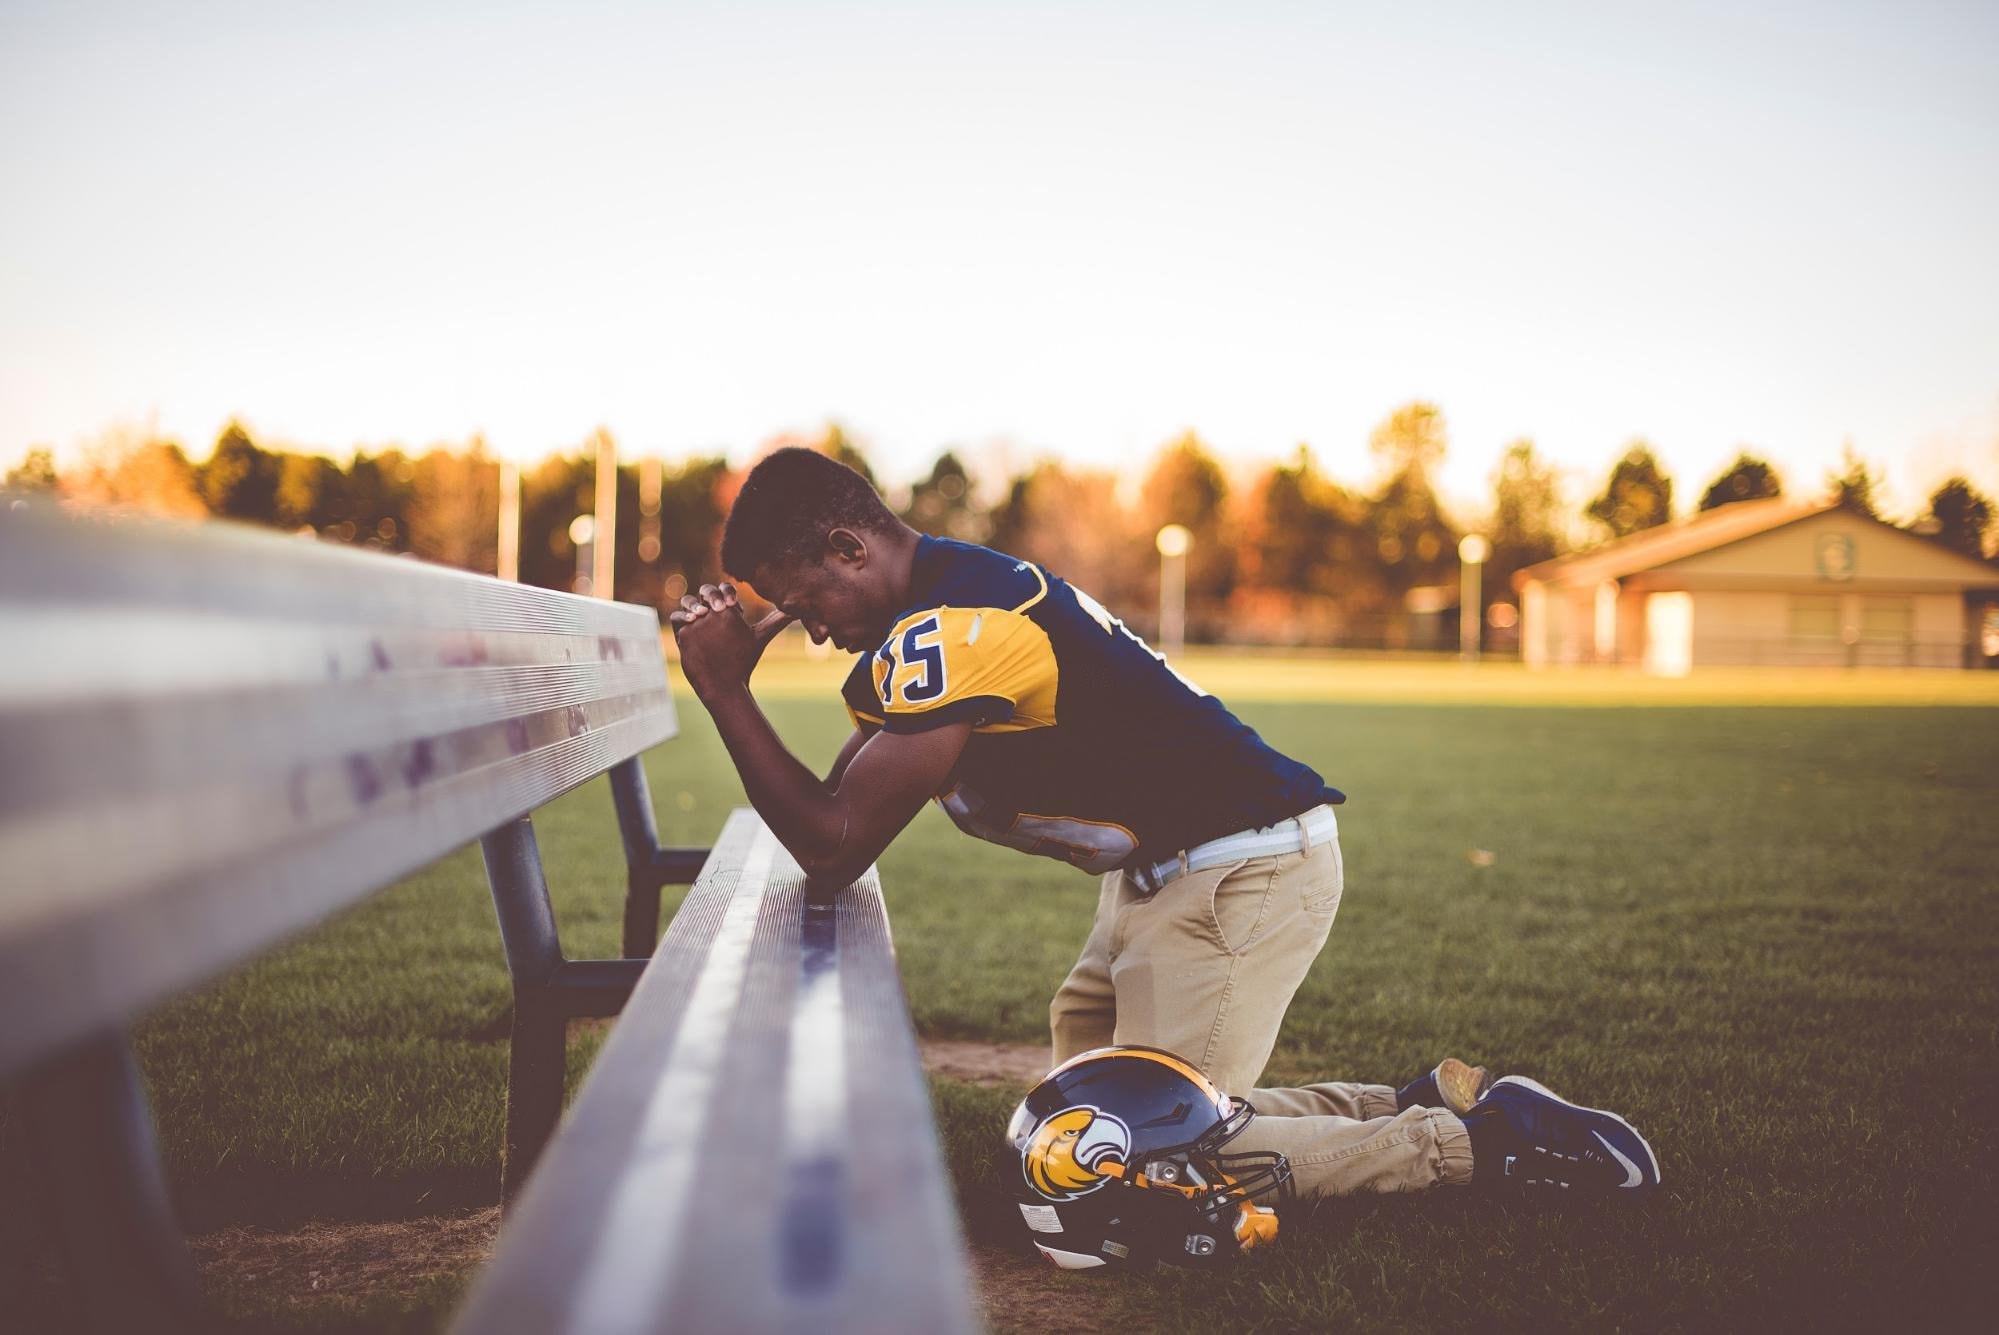 sports-photography-ben-white